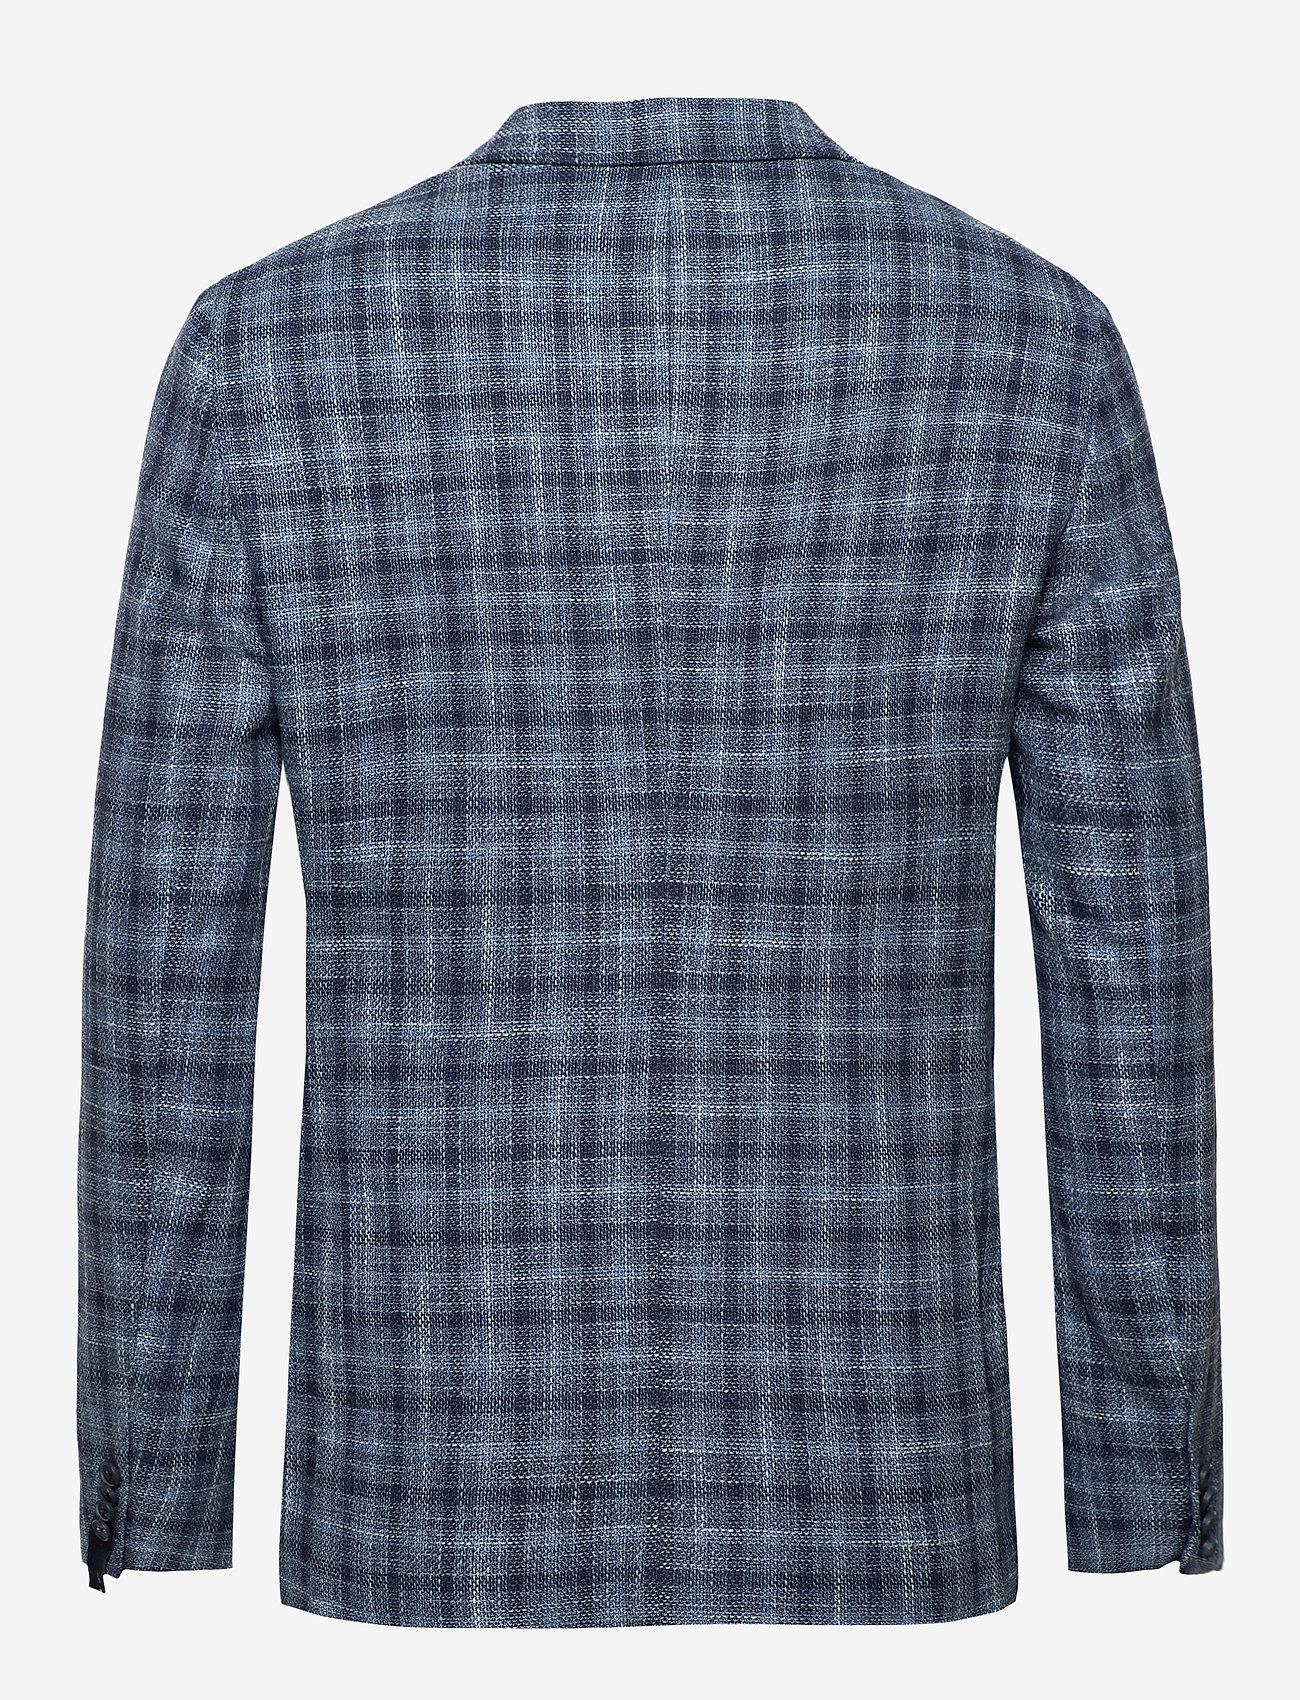 Tommy Hilfiger Tailored - COTTON BLEND SLIM FI - blazers à boutonnage simple - navy/iriscope/white - 1